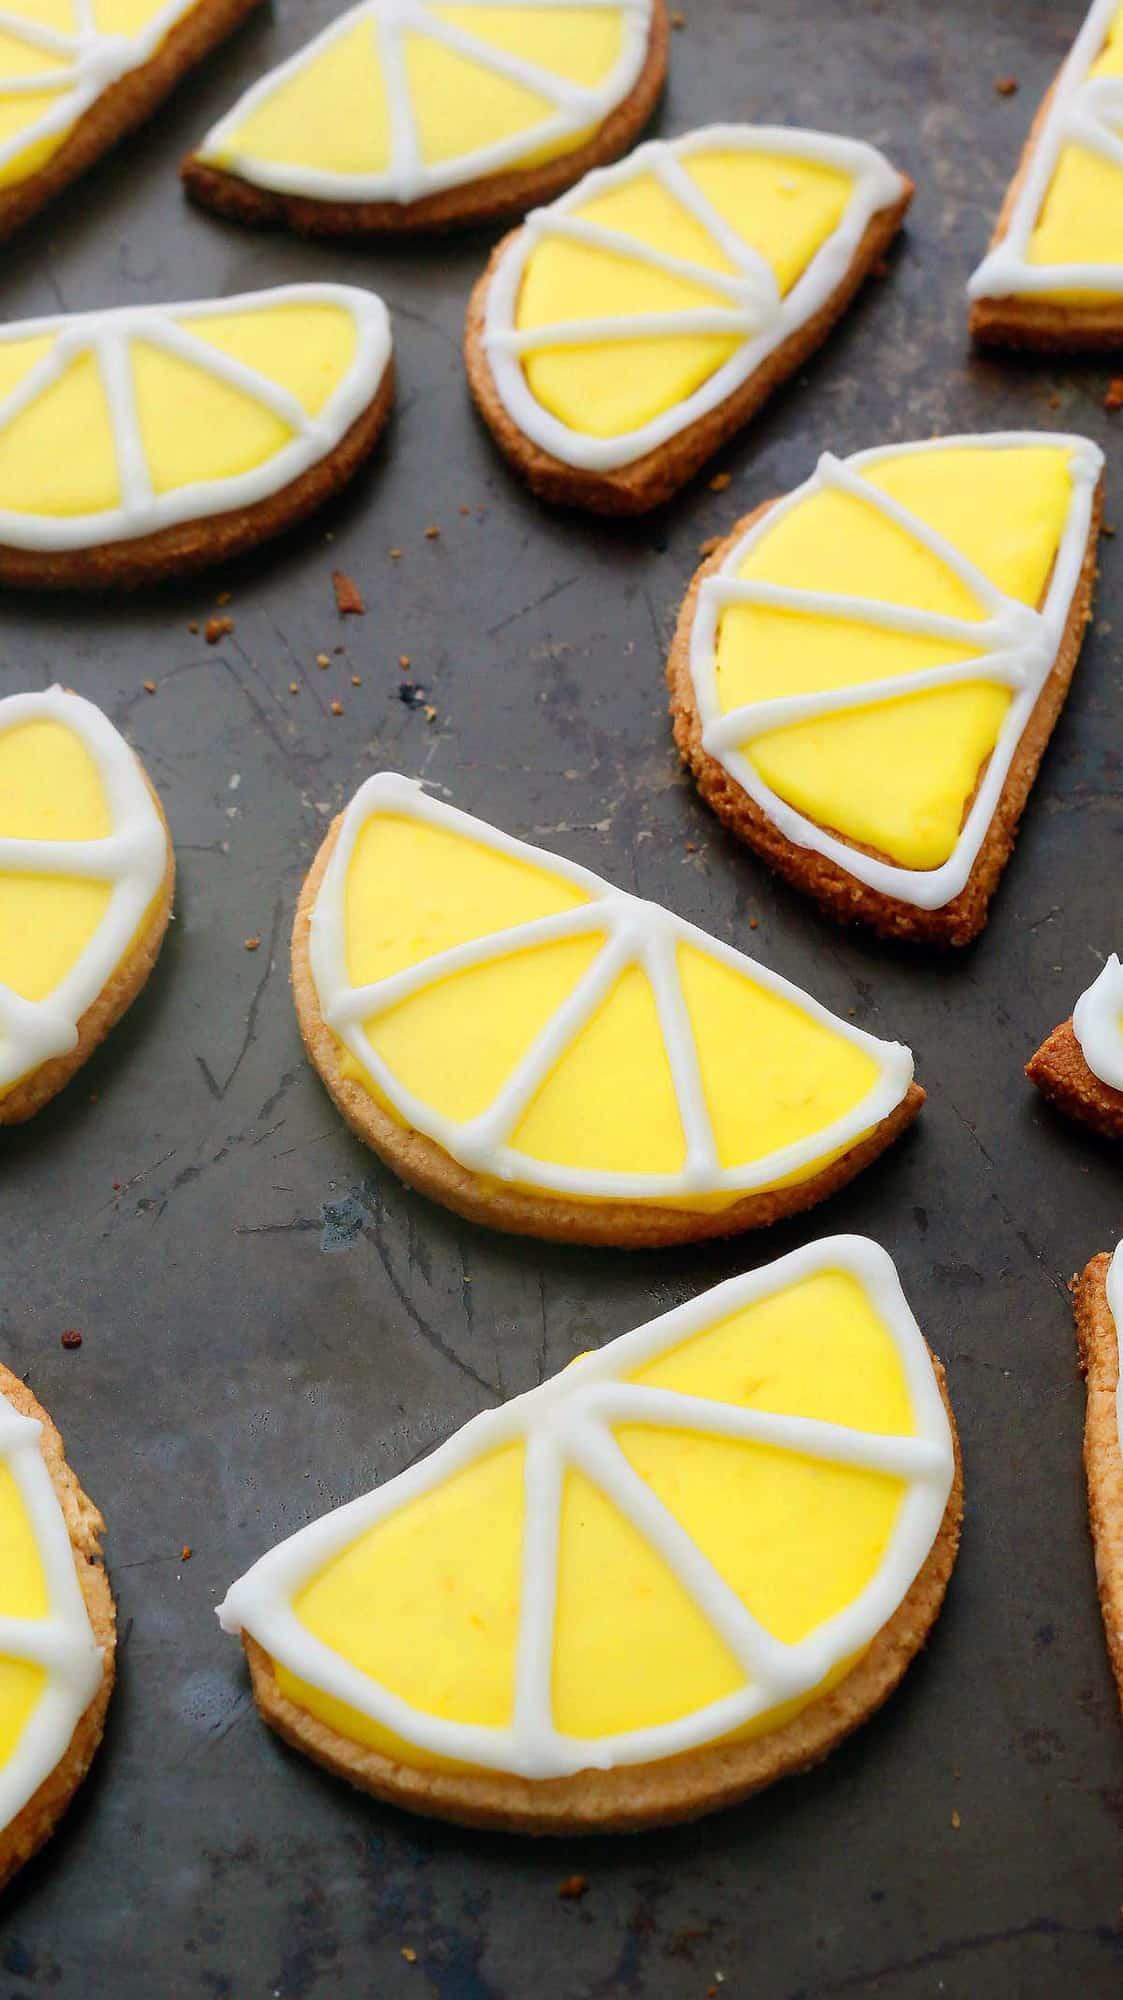 gluten free lemon cookies on a baking sheet